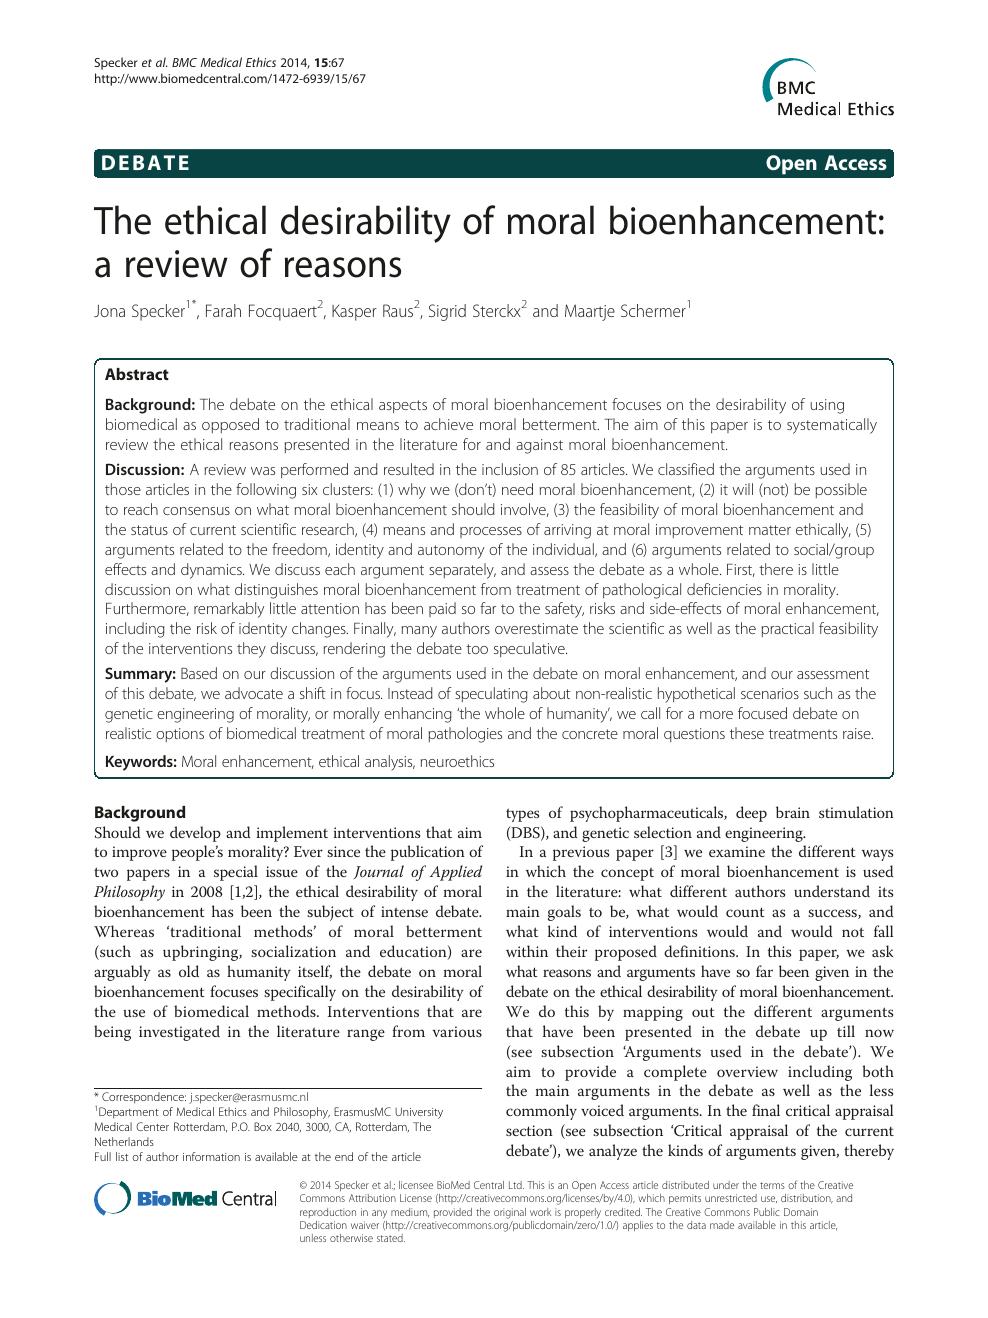 author responsibilities in publication ethics